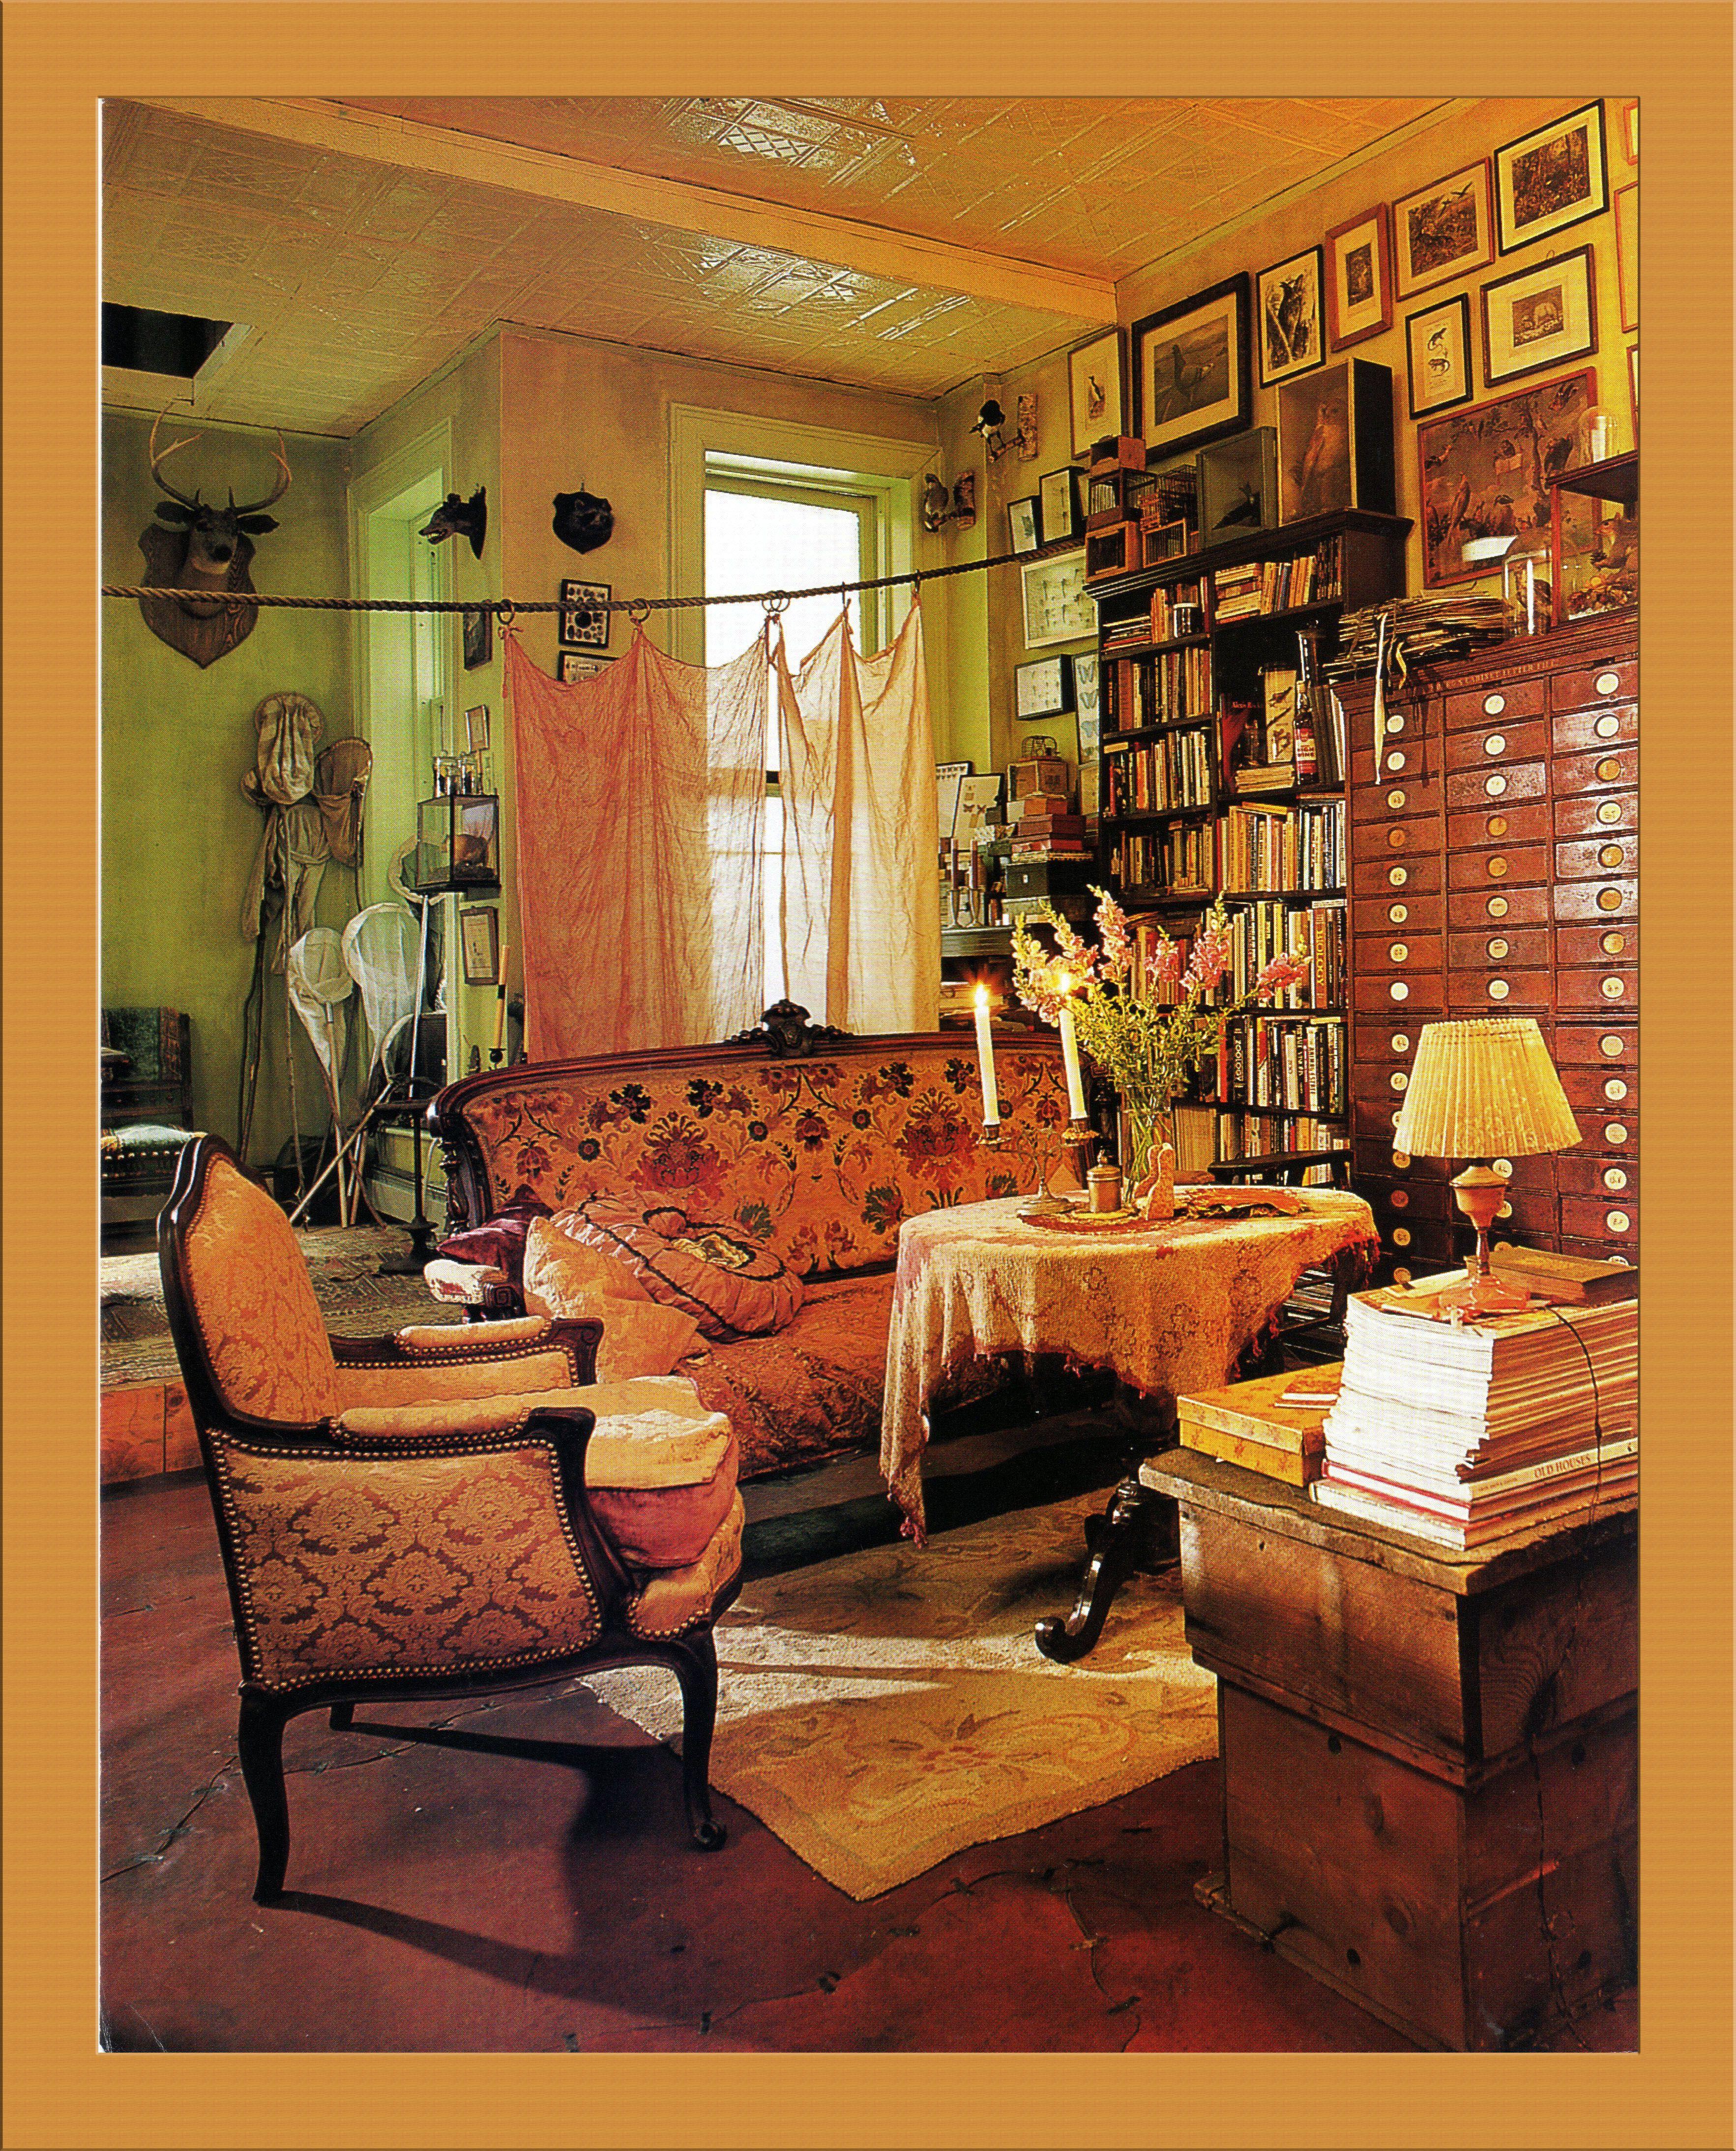 13 Myths About Bohemian Homedecor